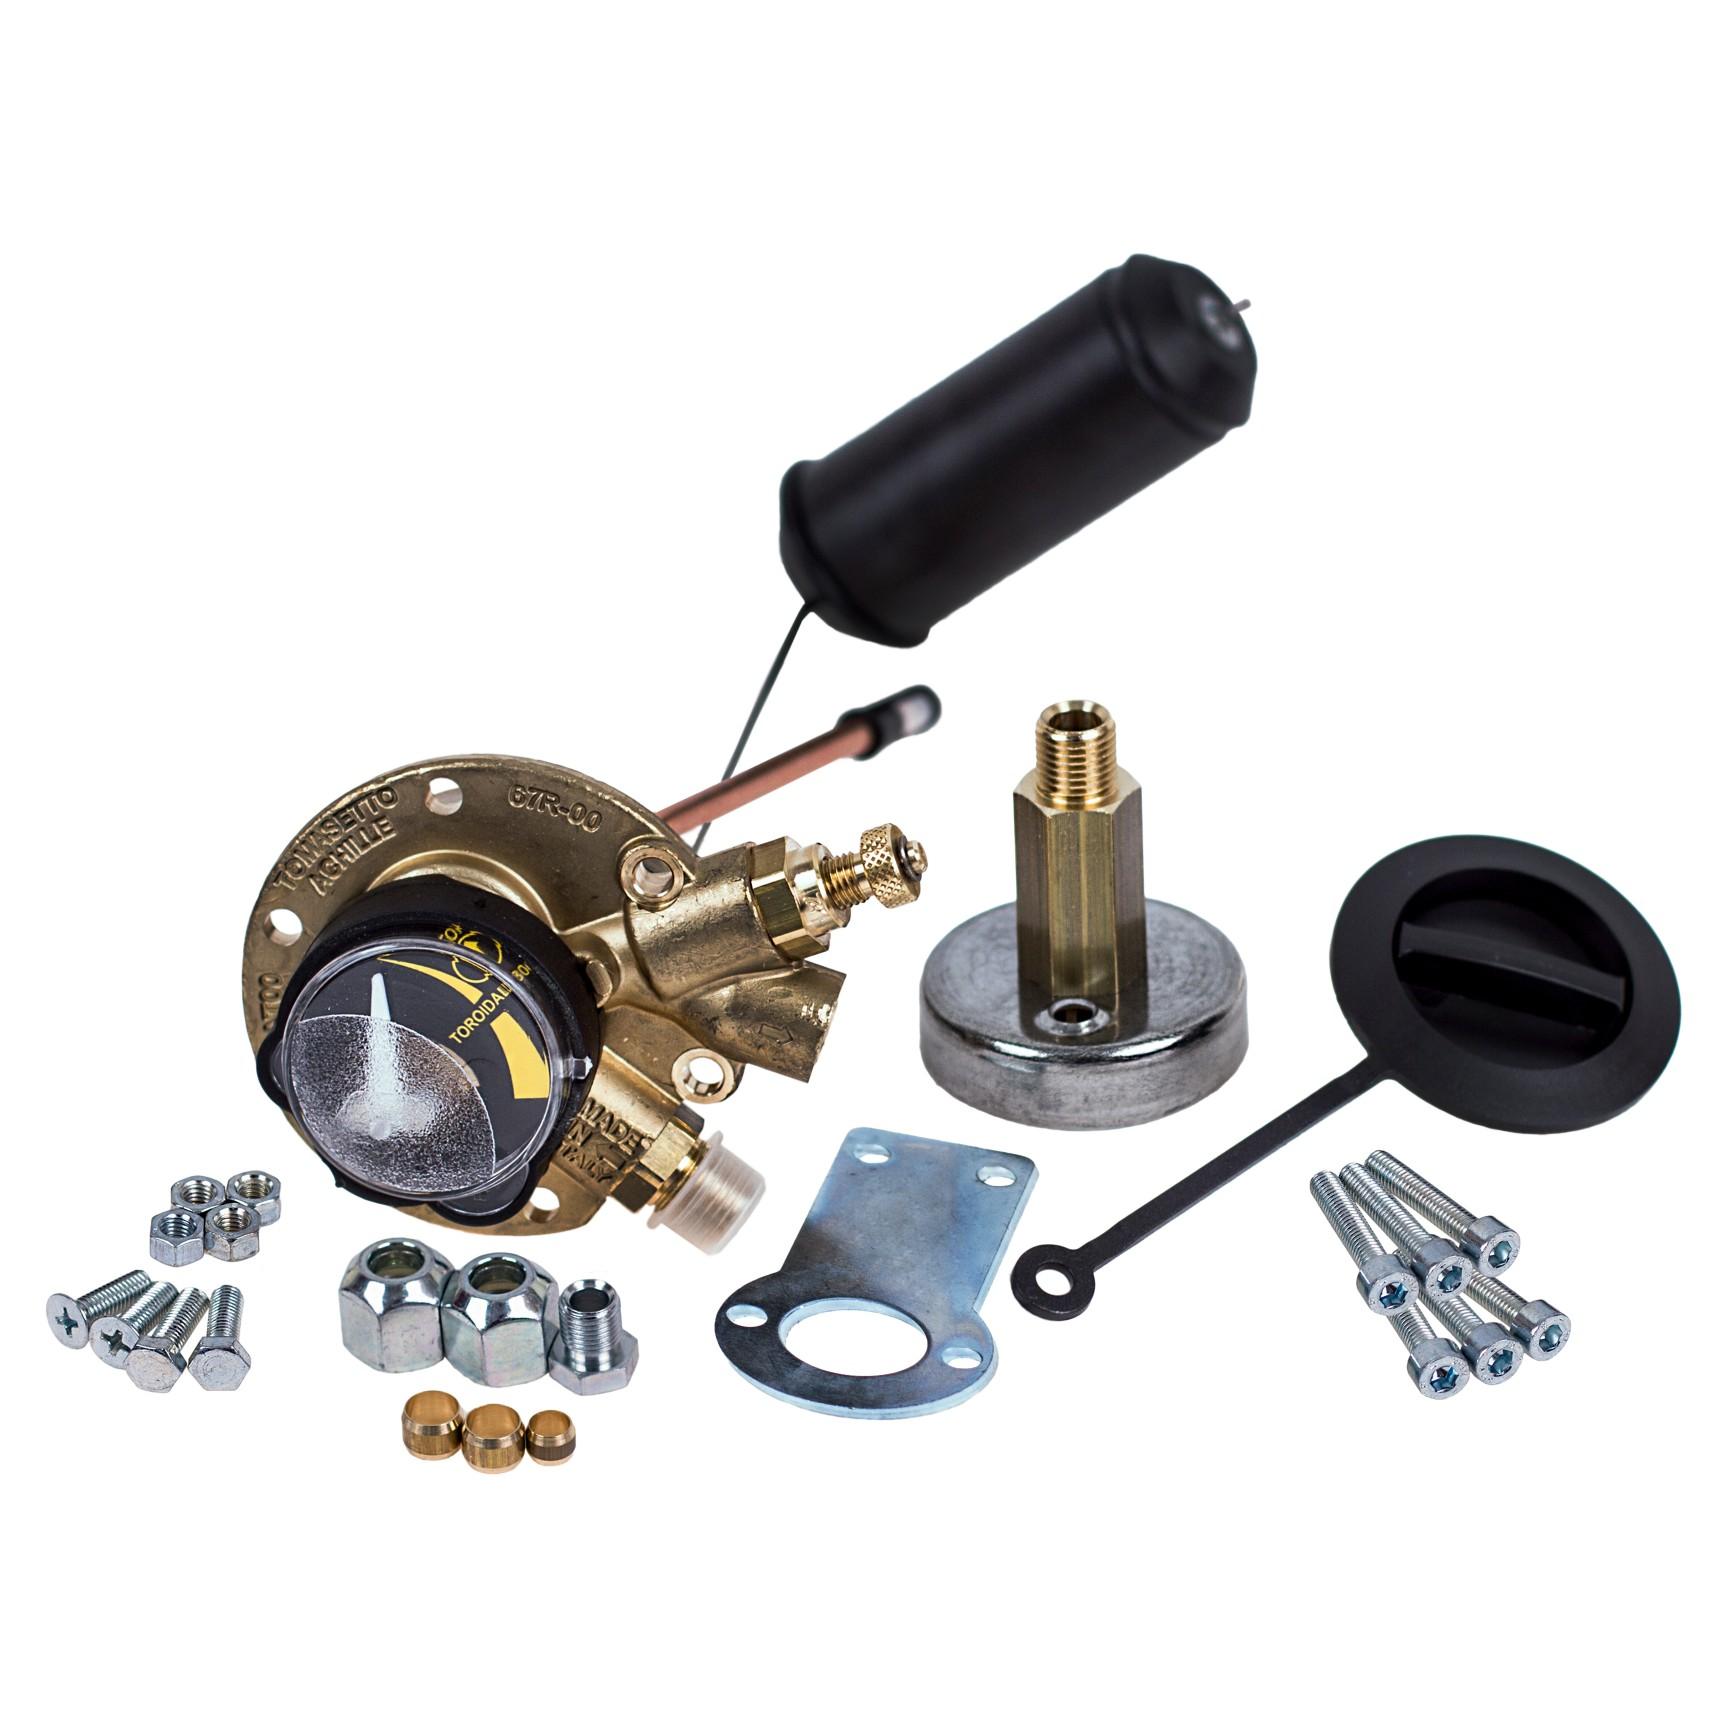 Multivalve Tomasetto AT00 200-204 30